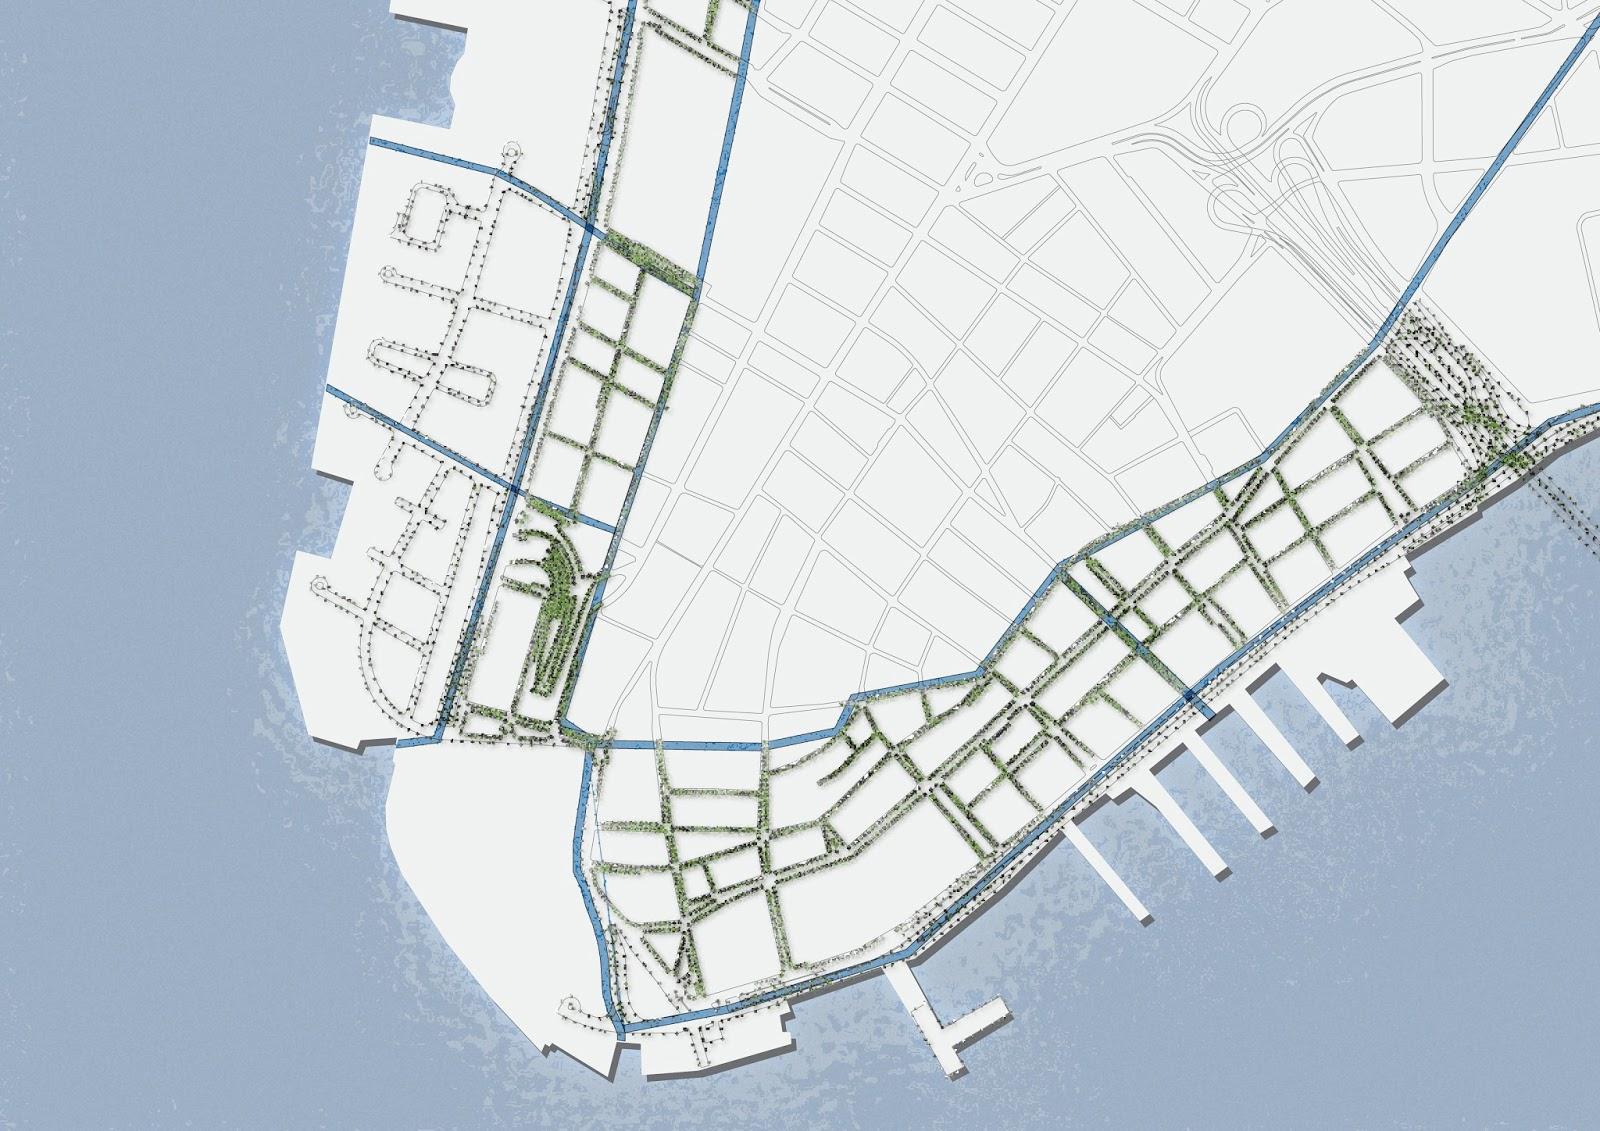 urban strata in transition